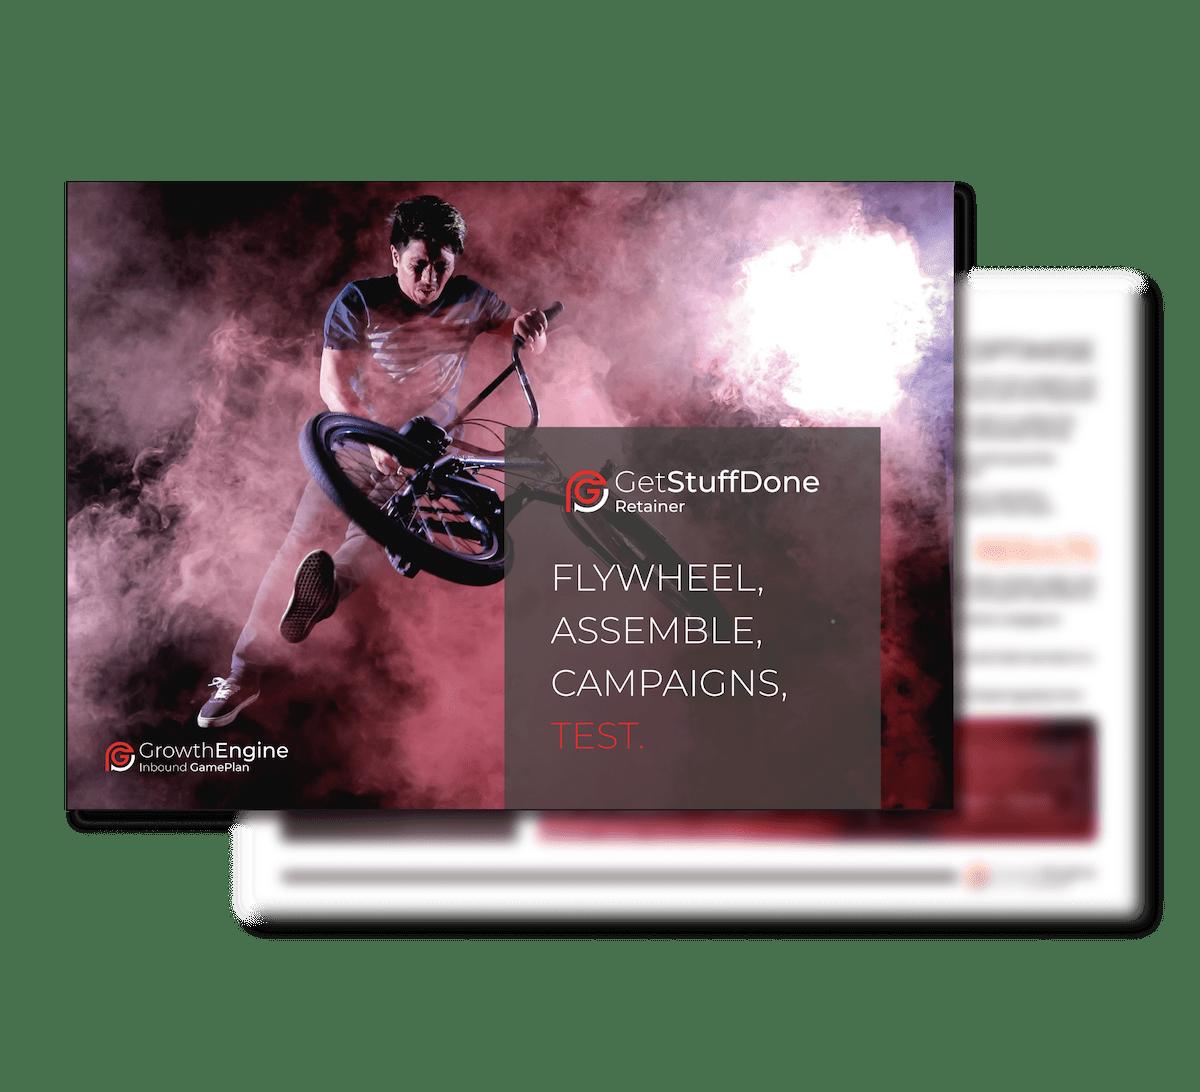 TSH - GrowthEngine Slick Covers_Get Stuff Done